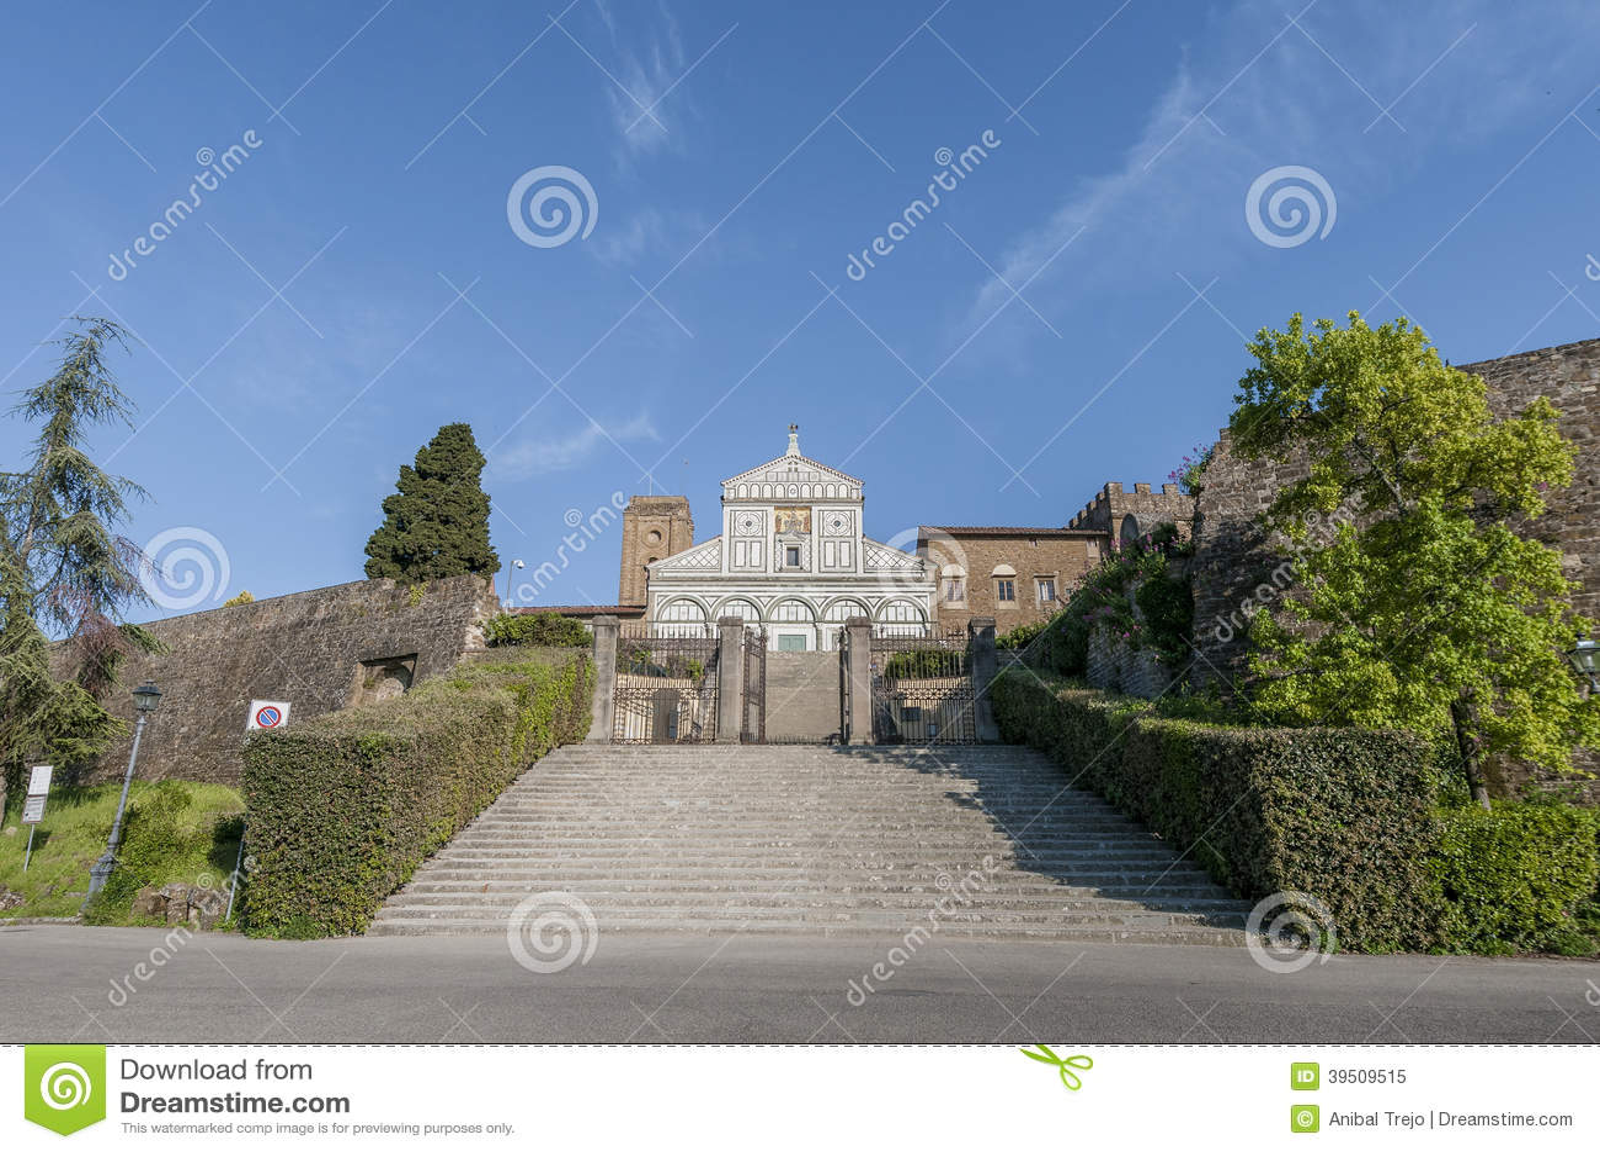 San Miniato al Monte basilica in Florence, Italy.